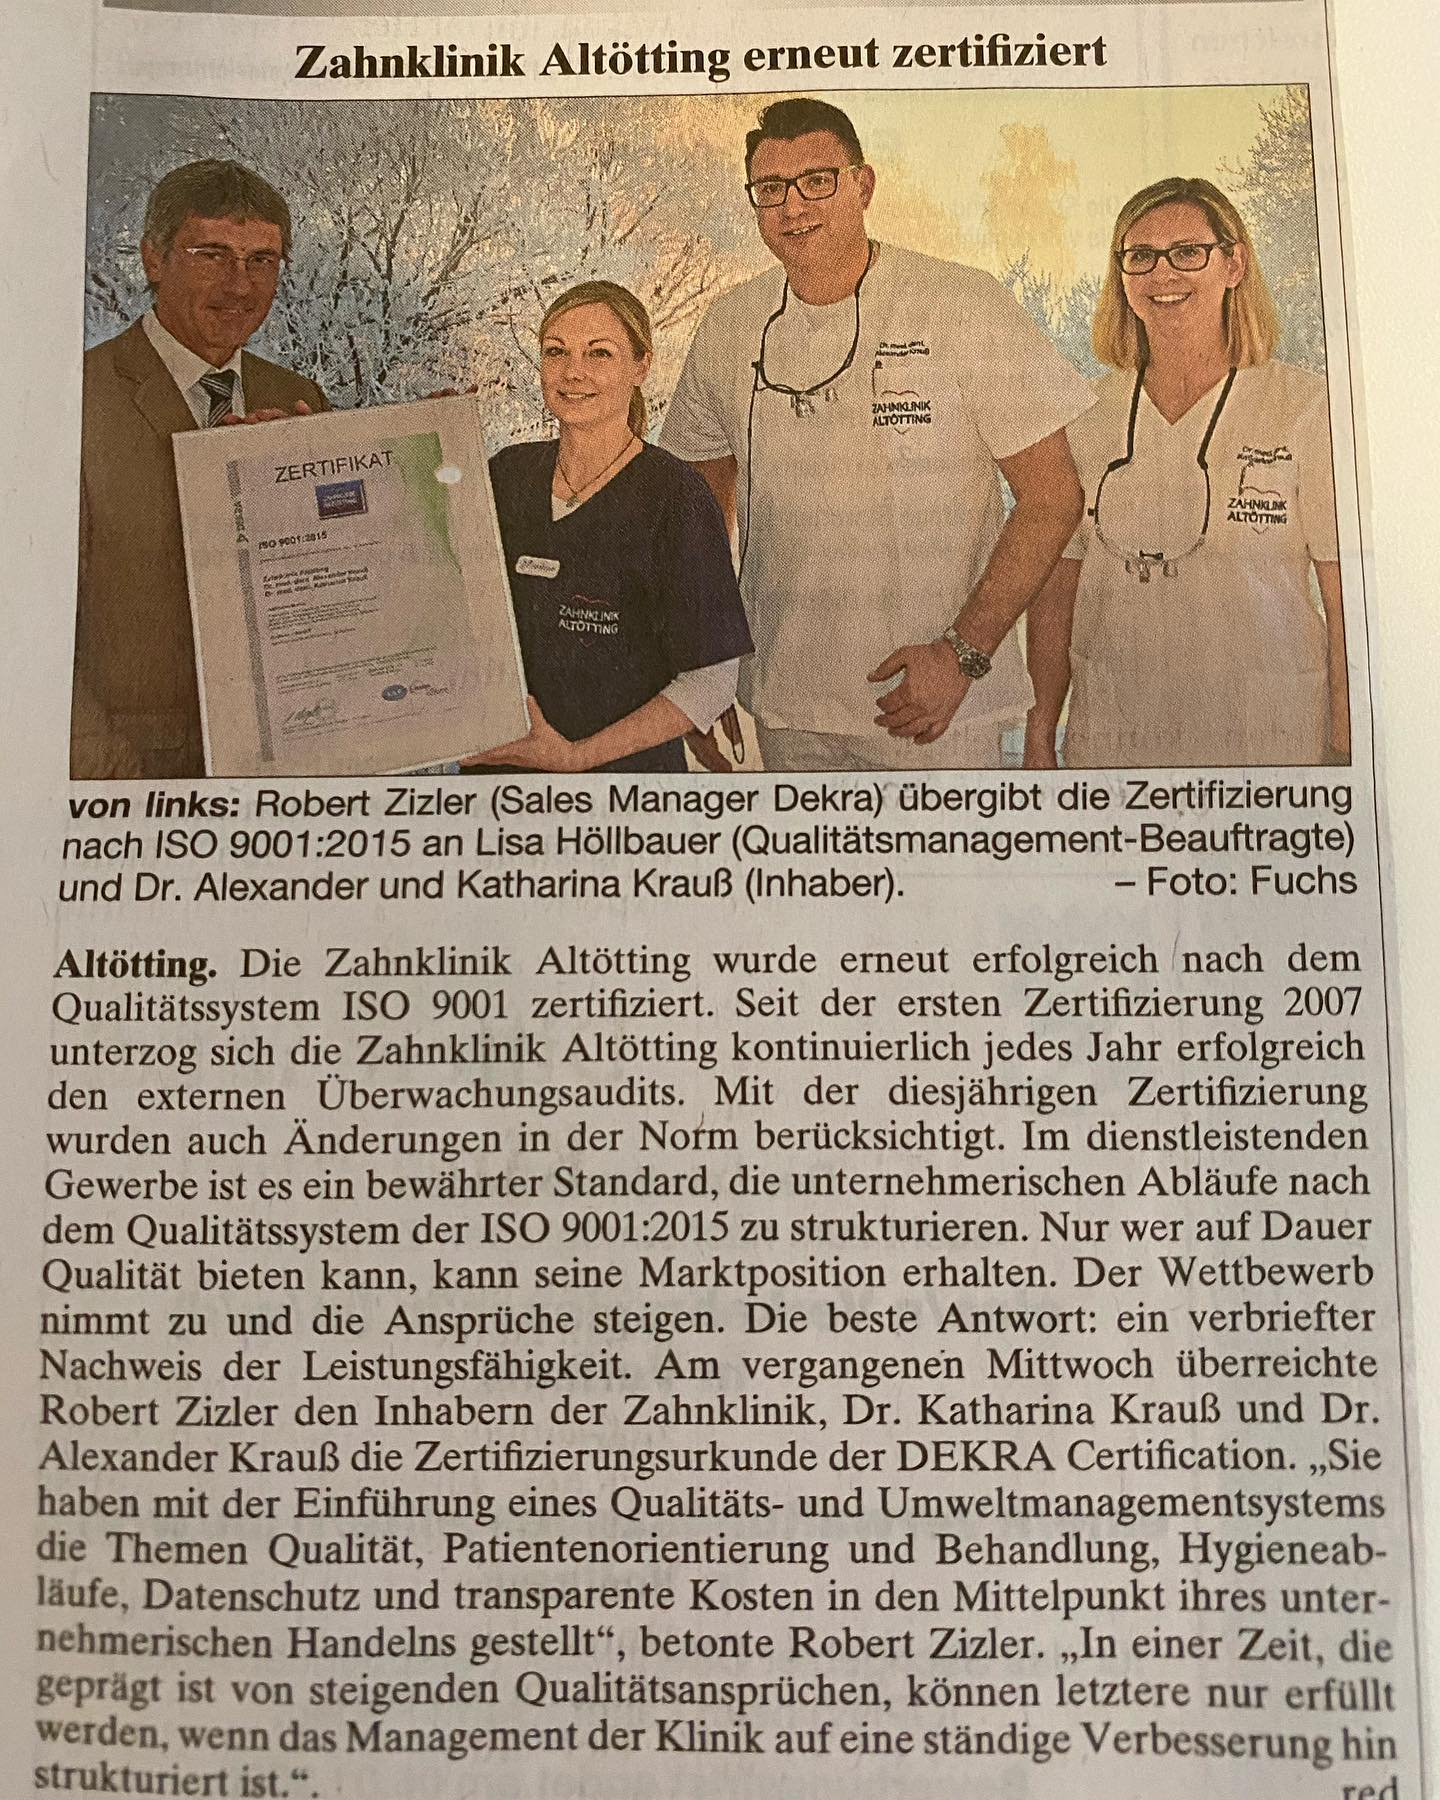 Zahnklinik-neu-zertifiziert